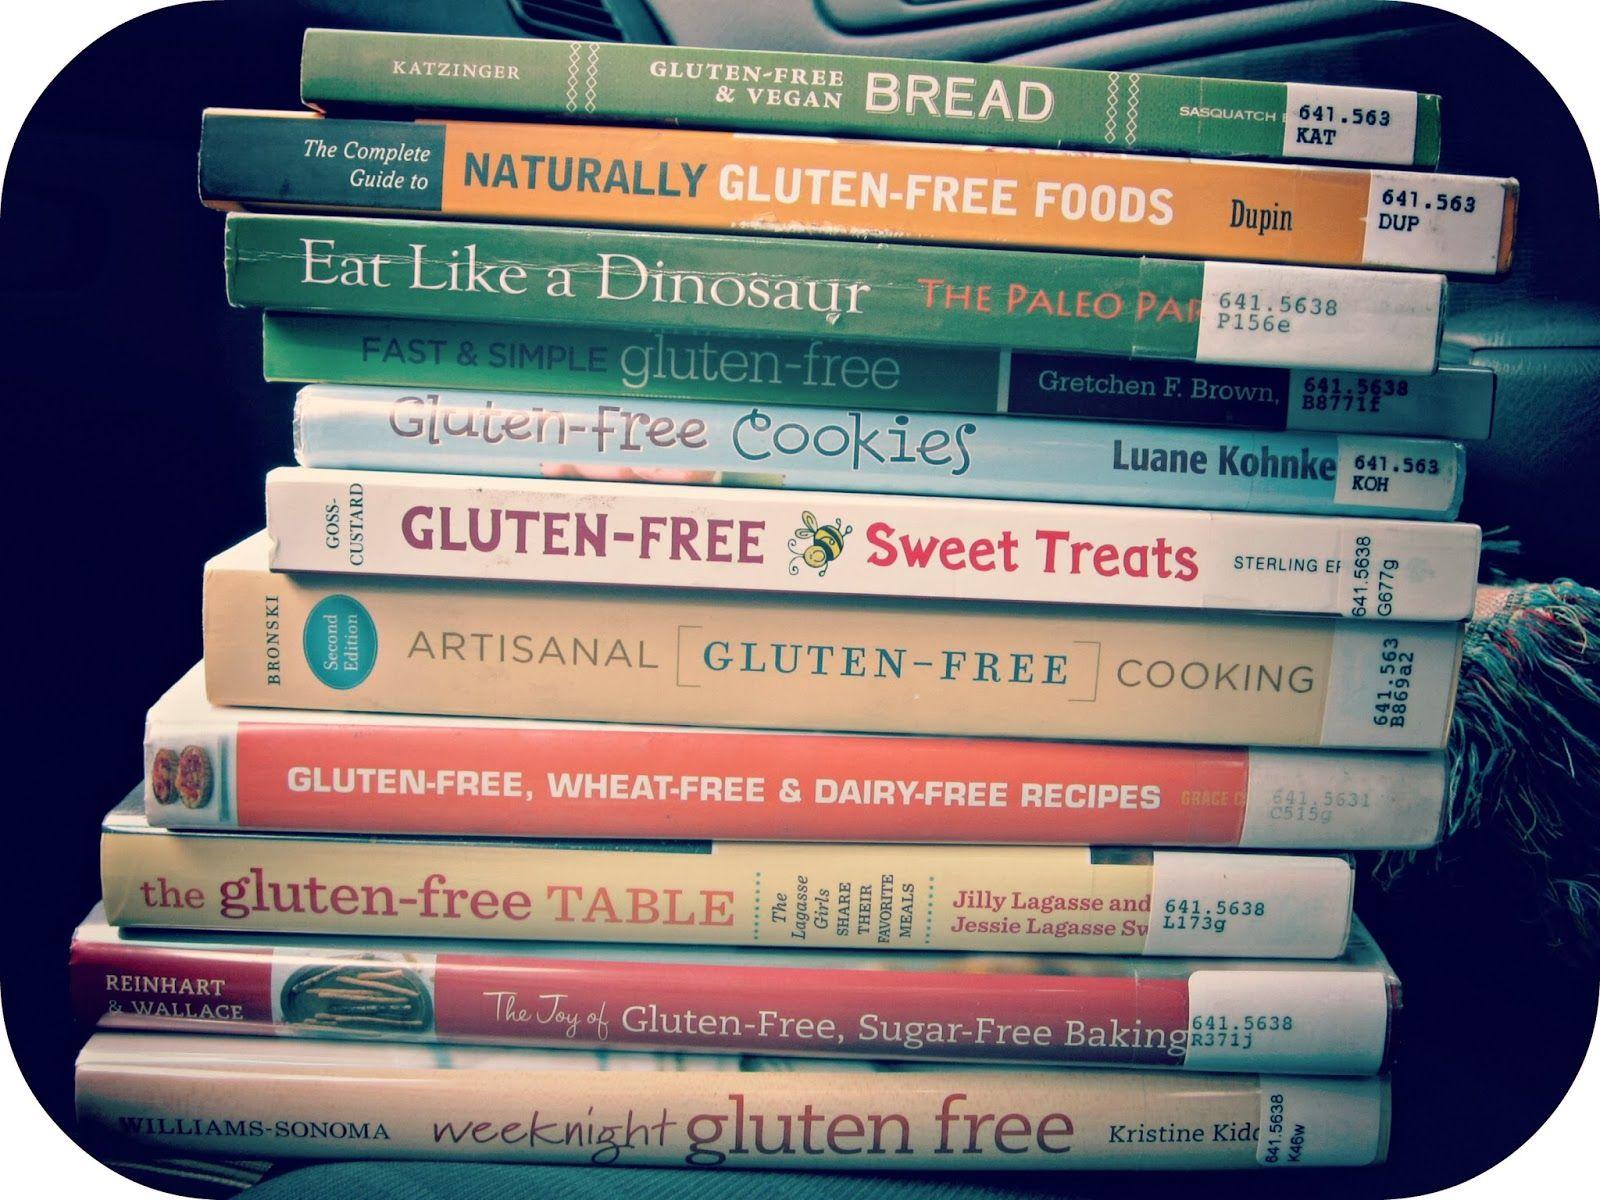 Cbus52 columbus in a year glutenfree research gluten